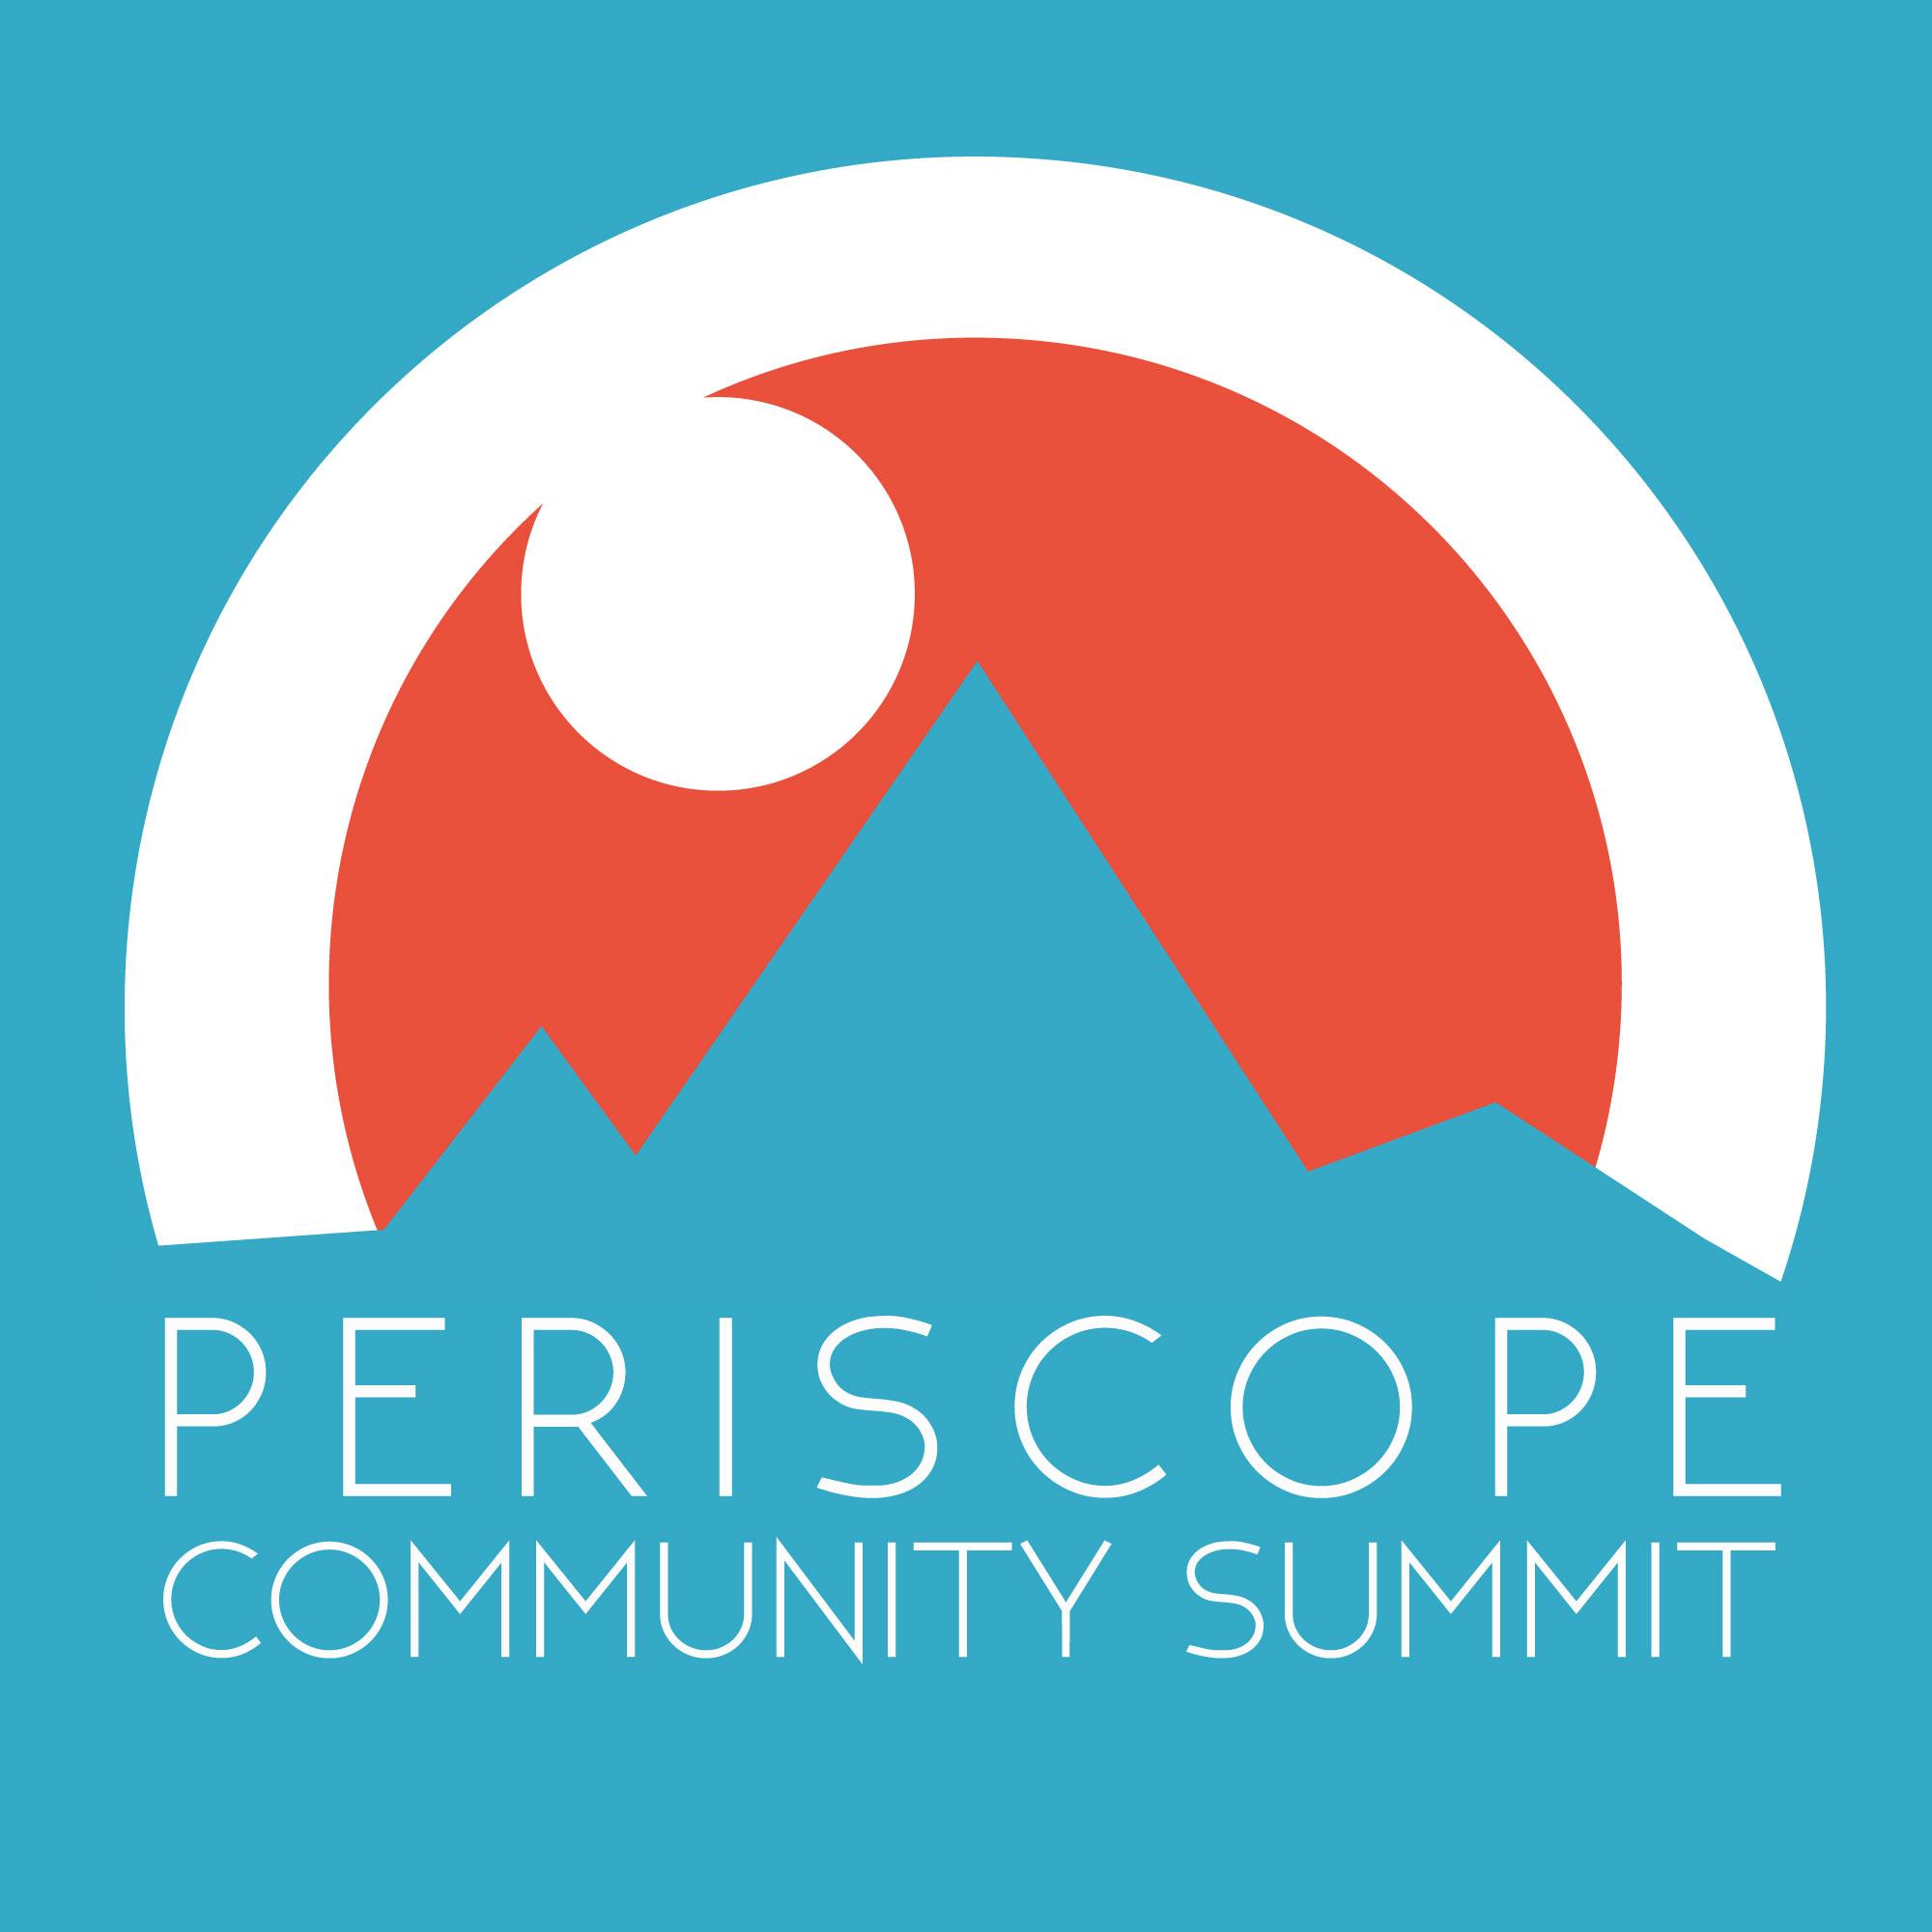 periscope_community_evergreen-BIG.jpg